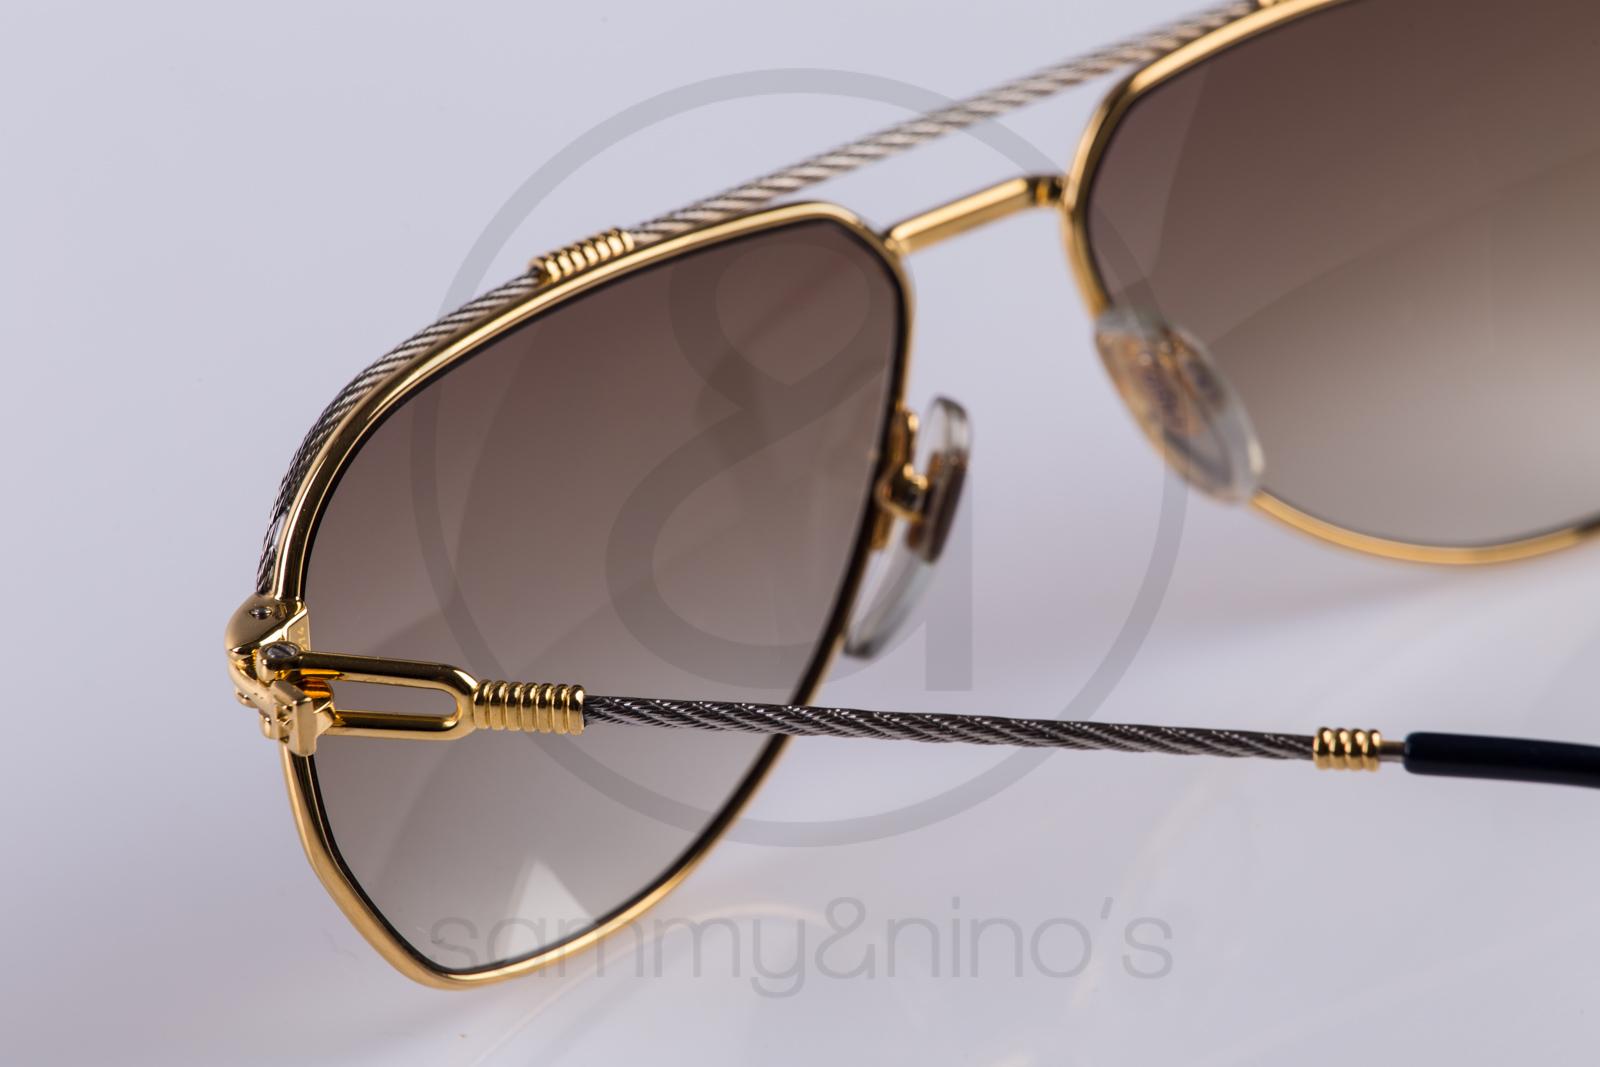 fred sunglasses